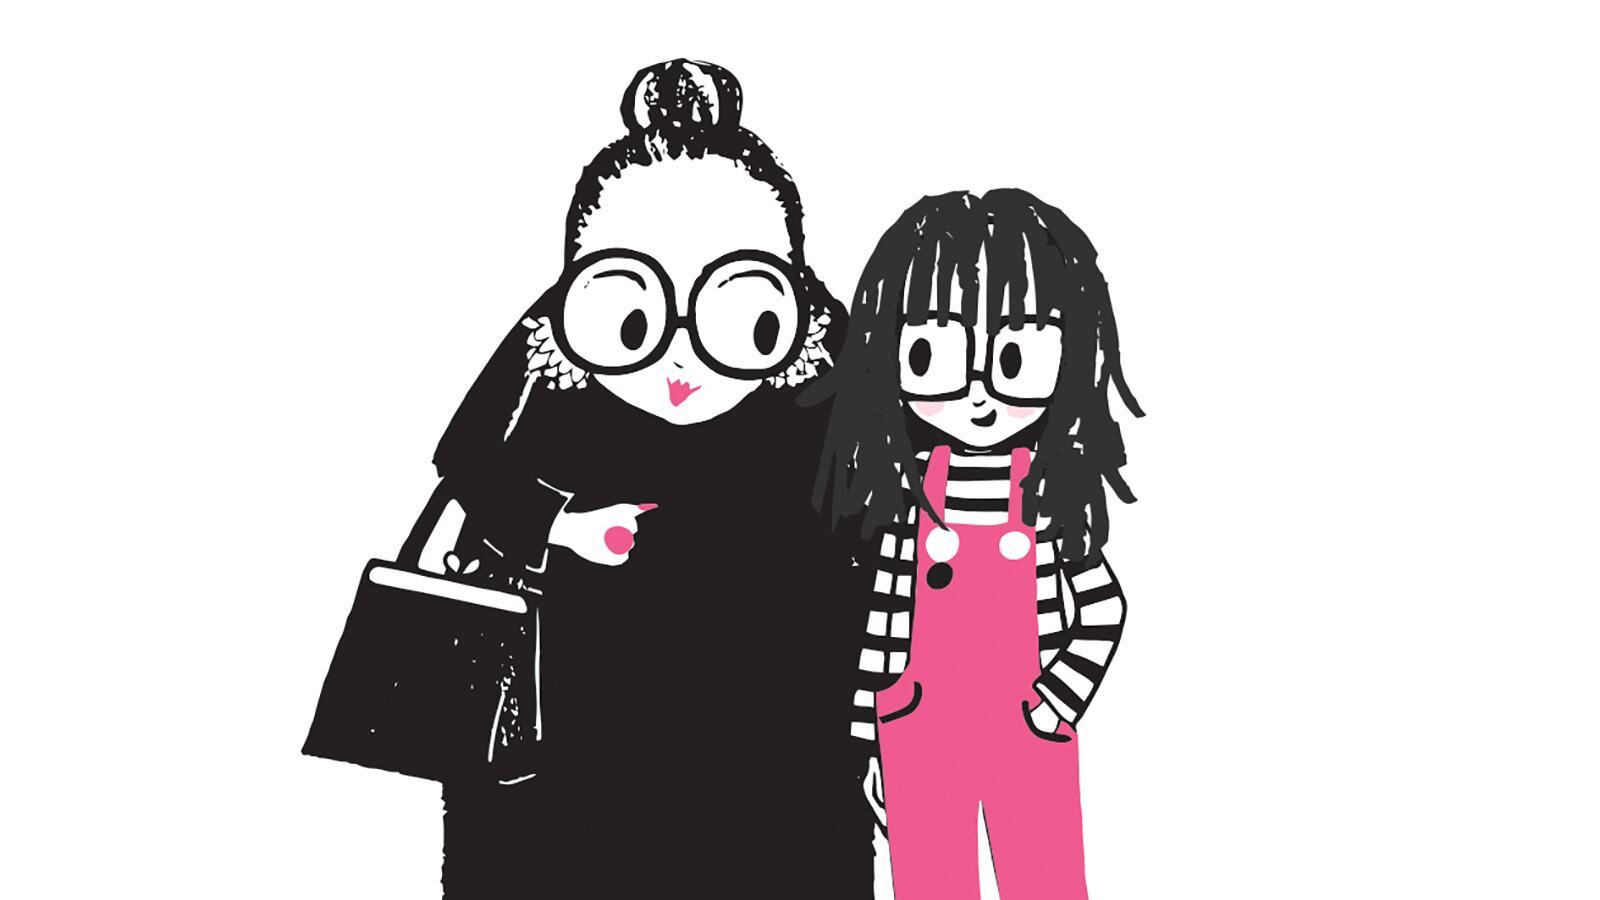 Bad Nana illustration